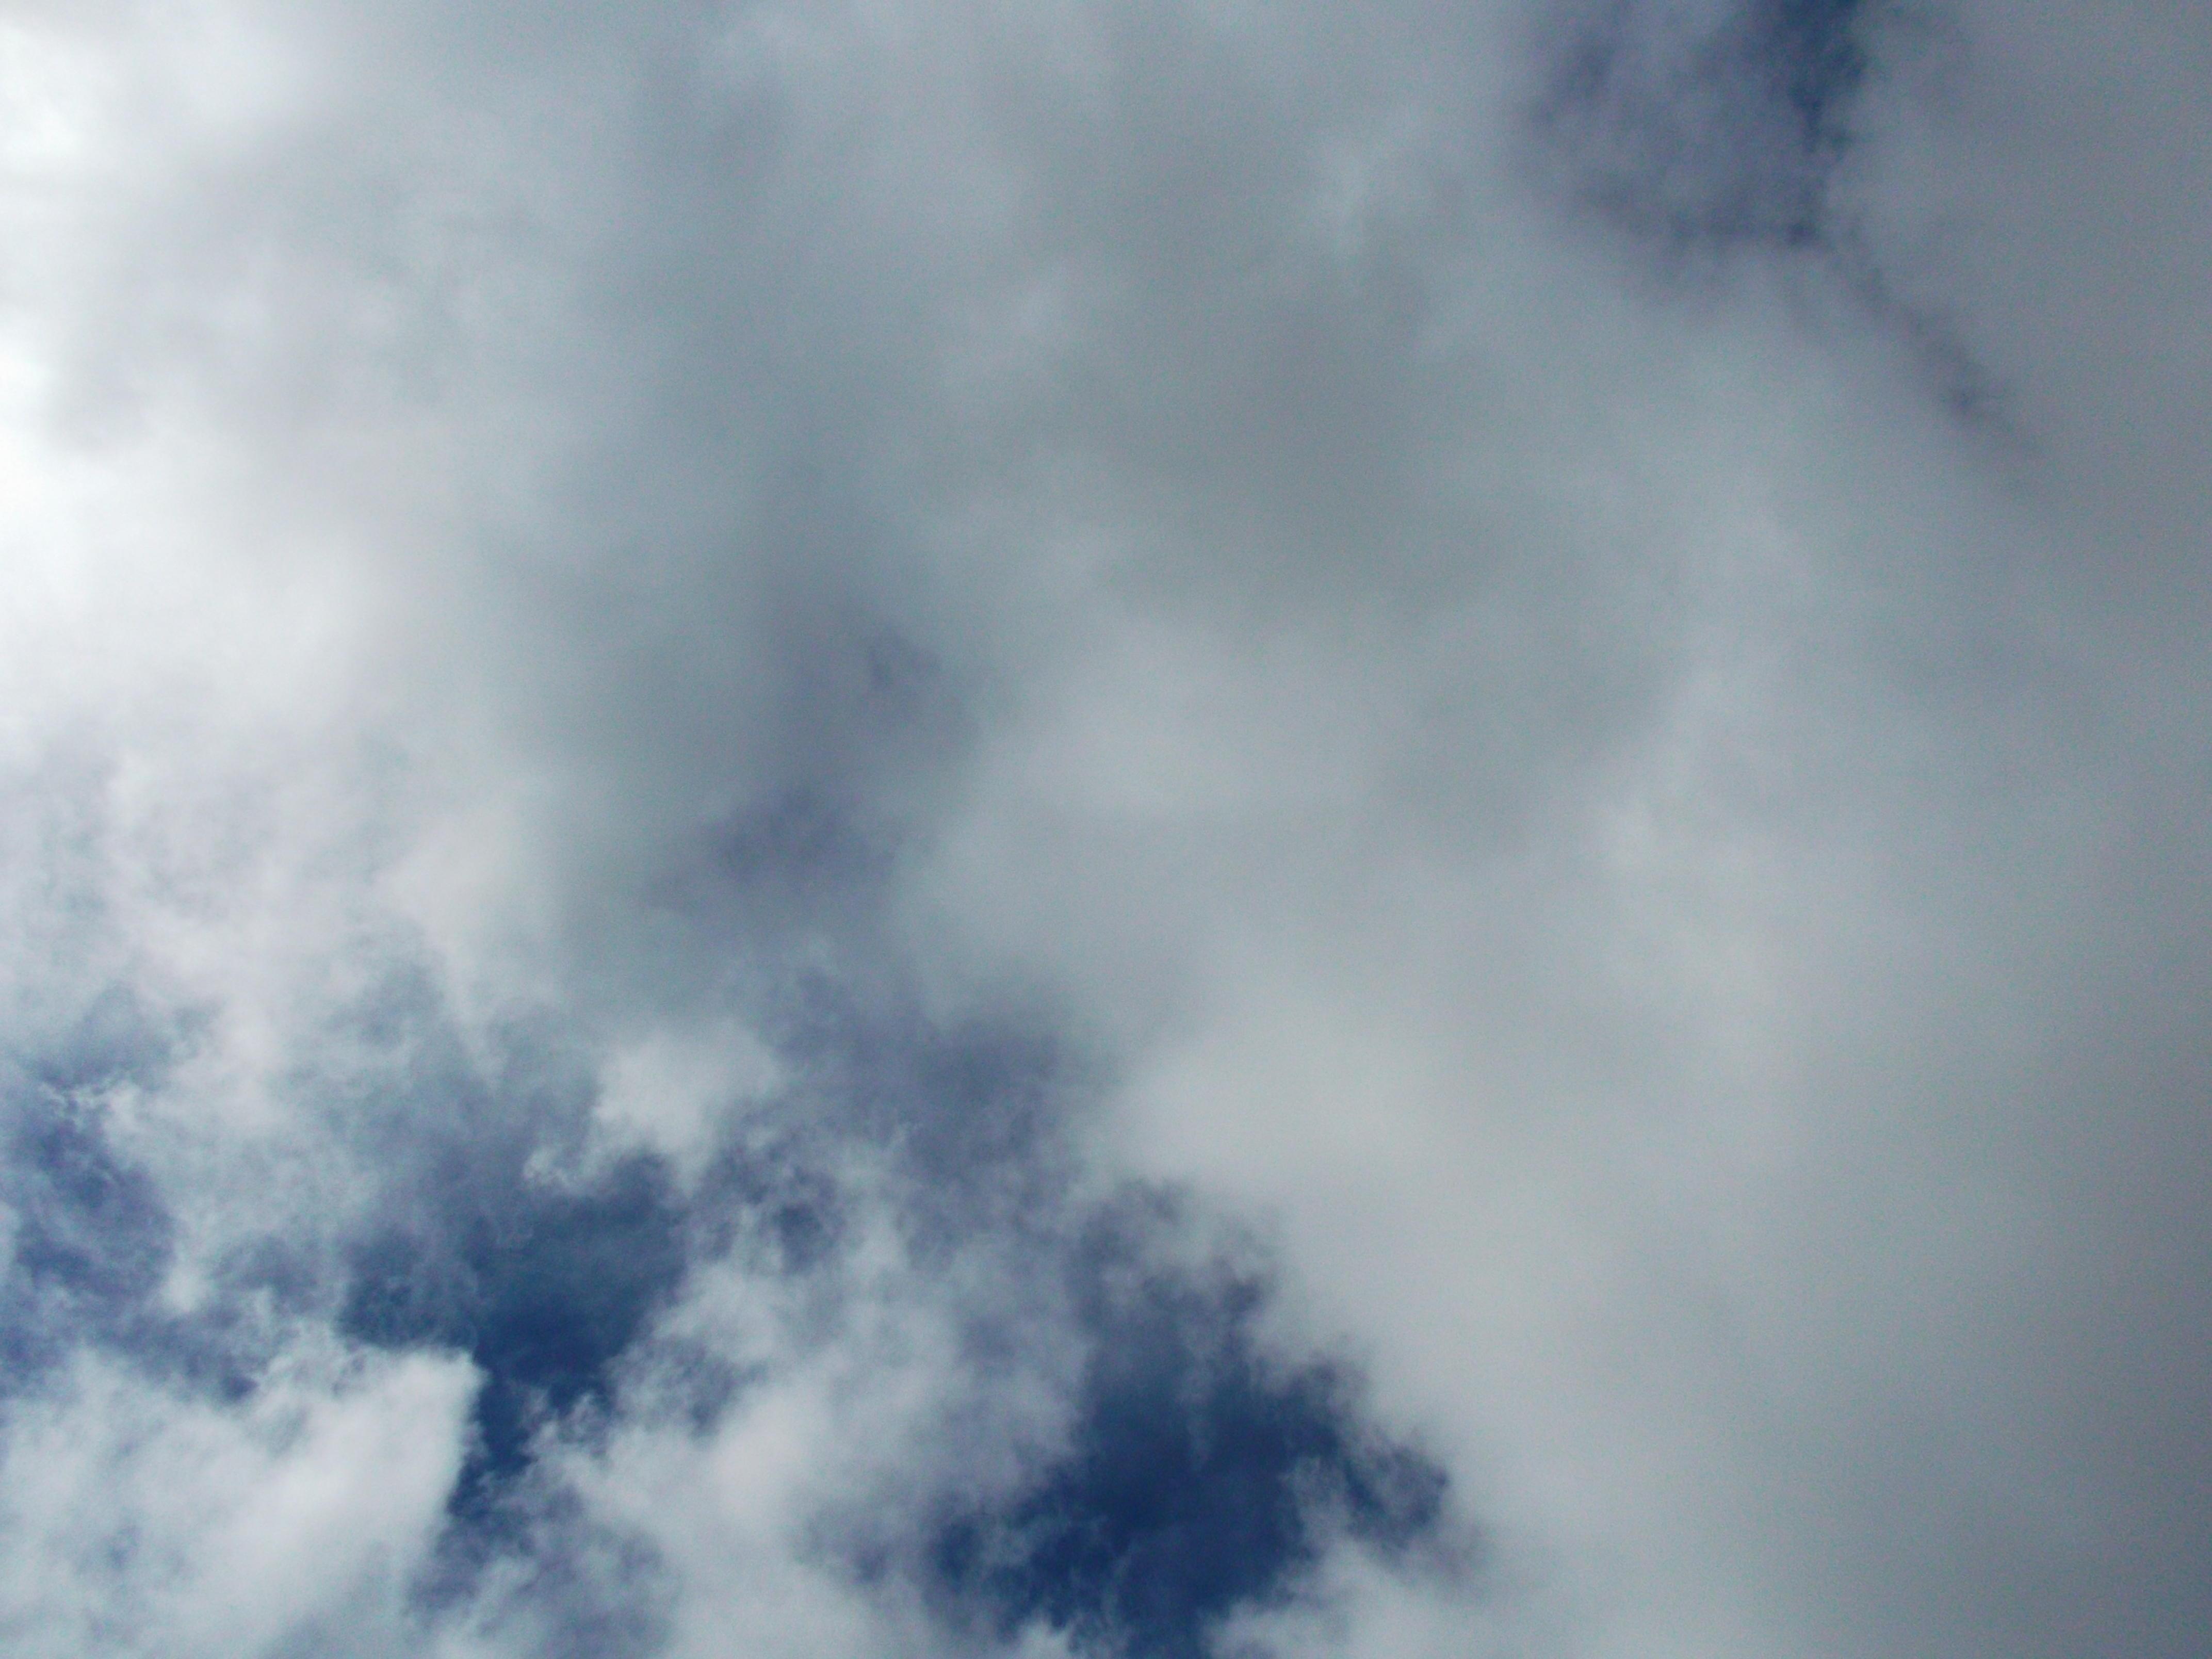 2013-04-09 Longitude -0.371 Latitude 49.182 Altitude 29 Heure 12h34